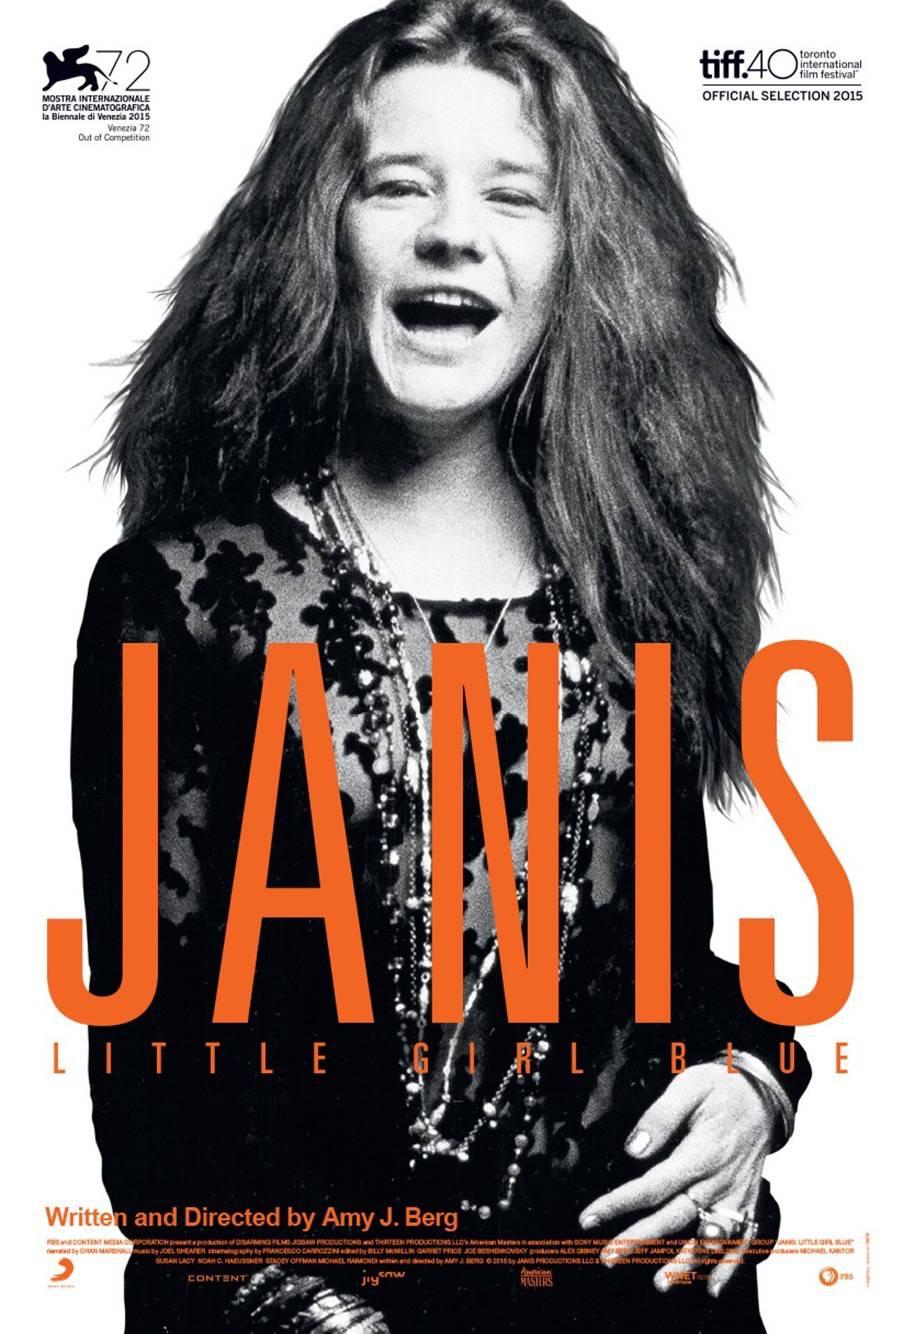 http://sentireascoltare.com/wp-content/uploads/2016/05/janis-poster-documentary.jpg